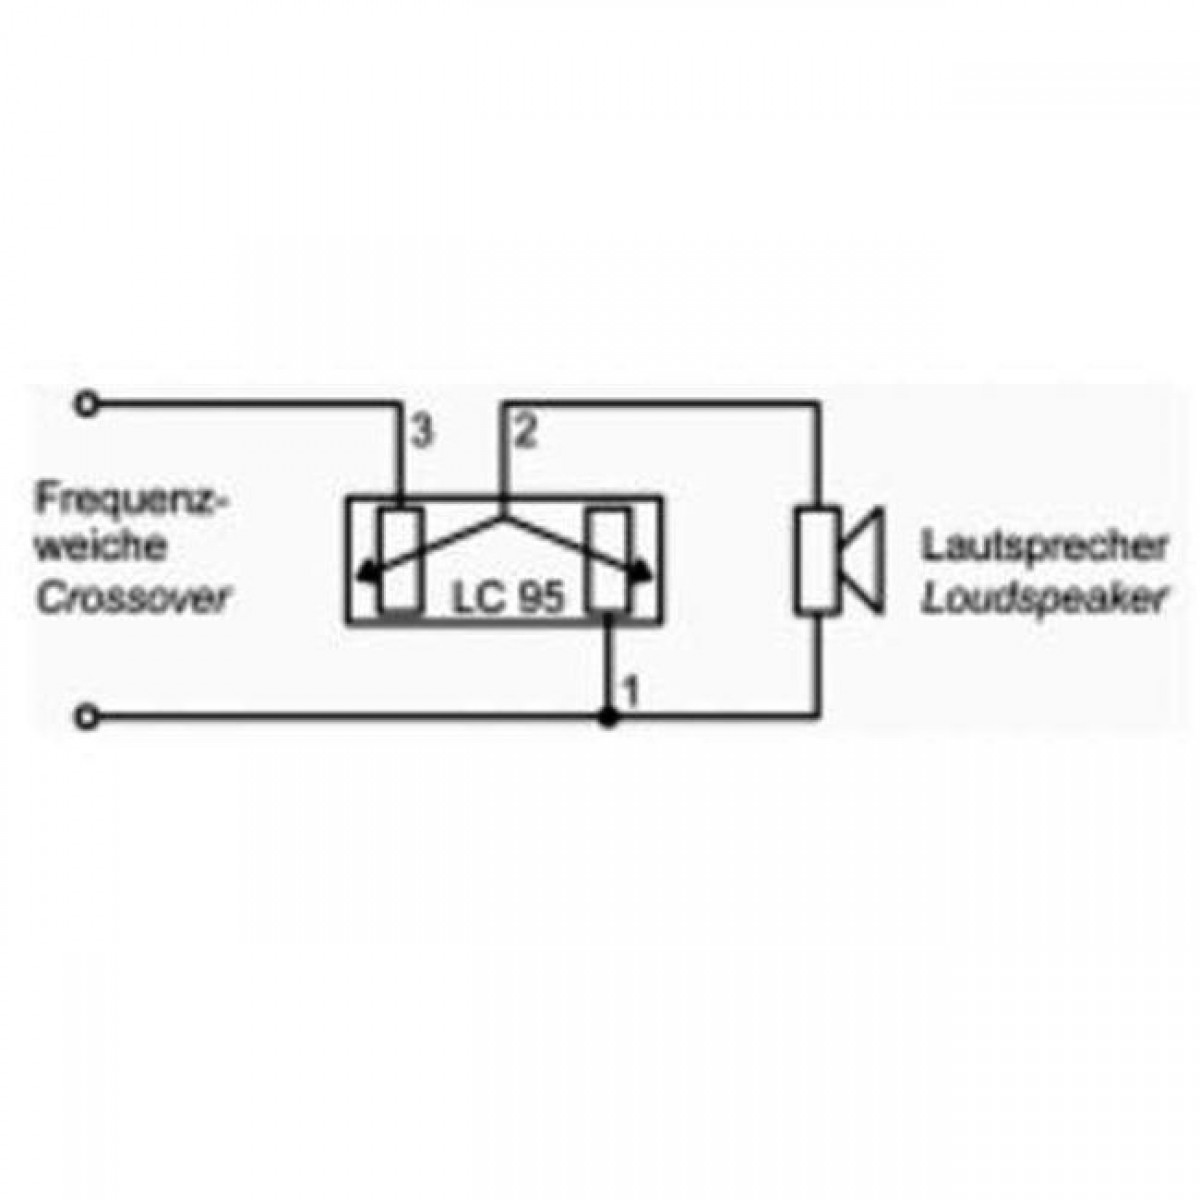 Lautsprecher Symbol Schaltplan